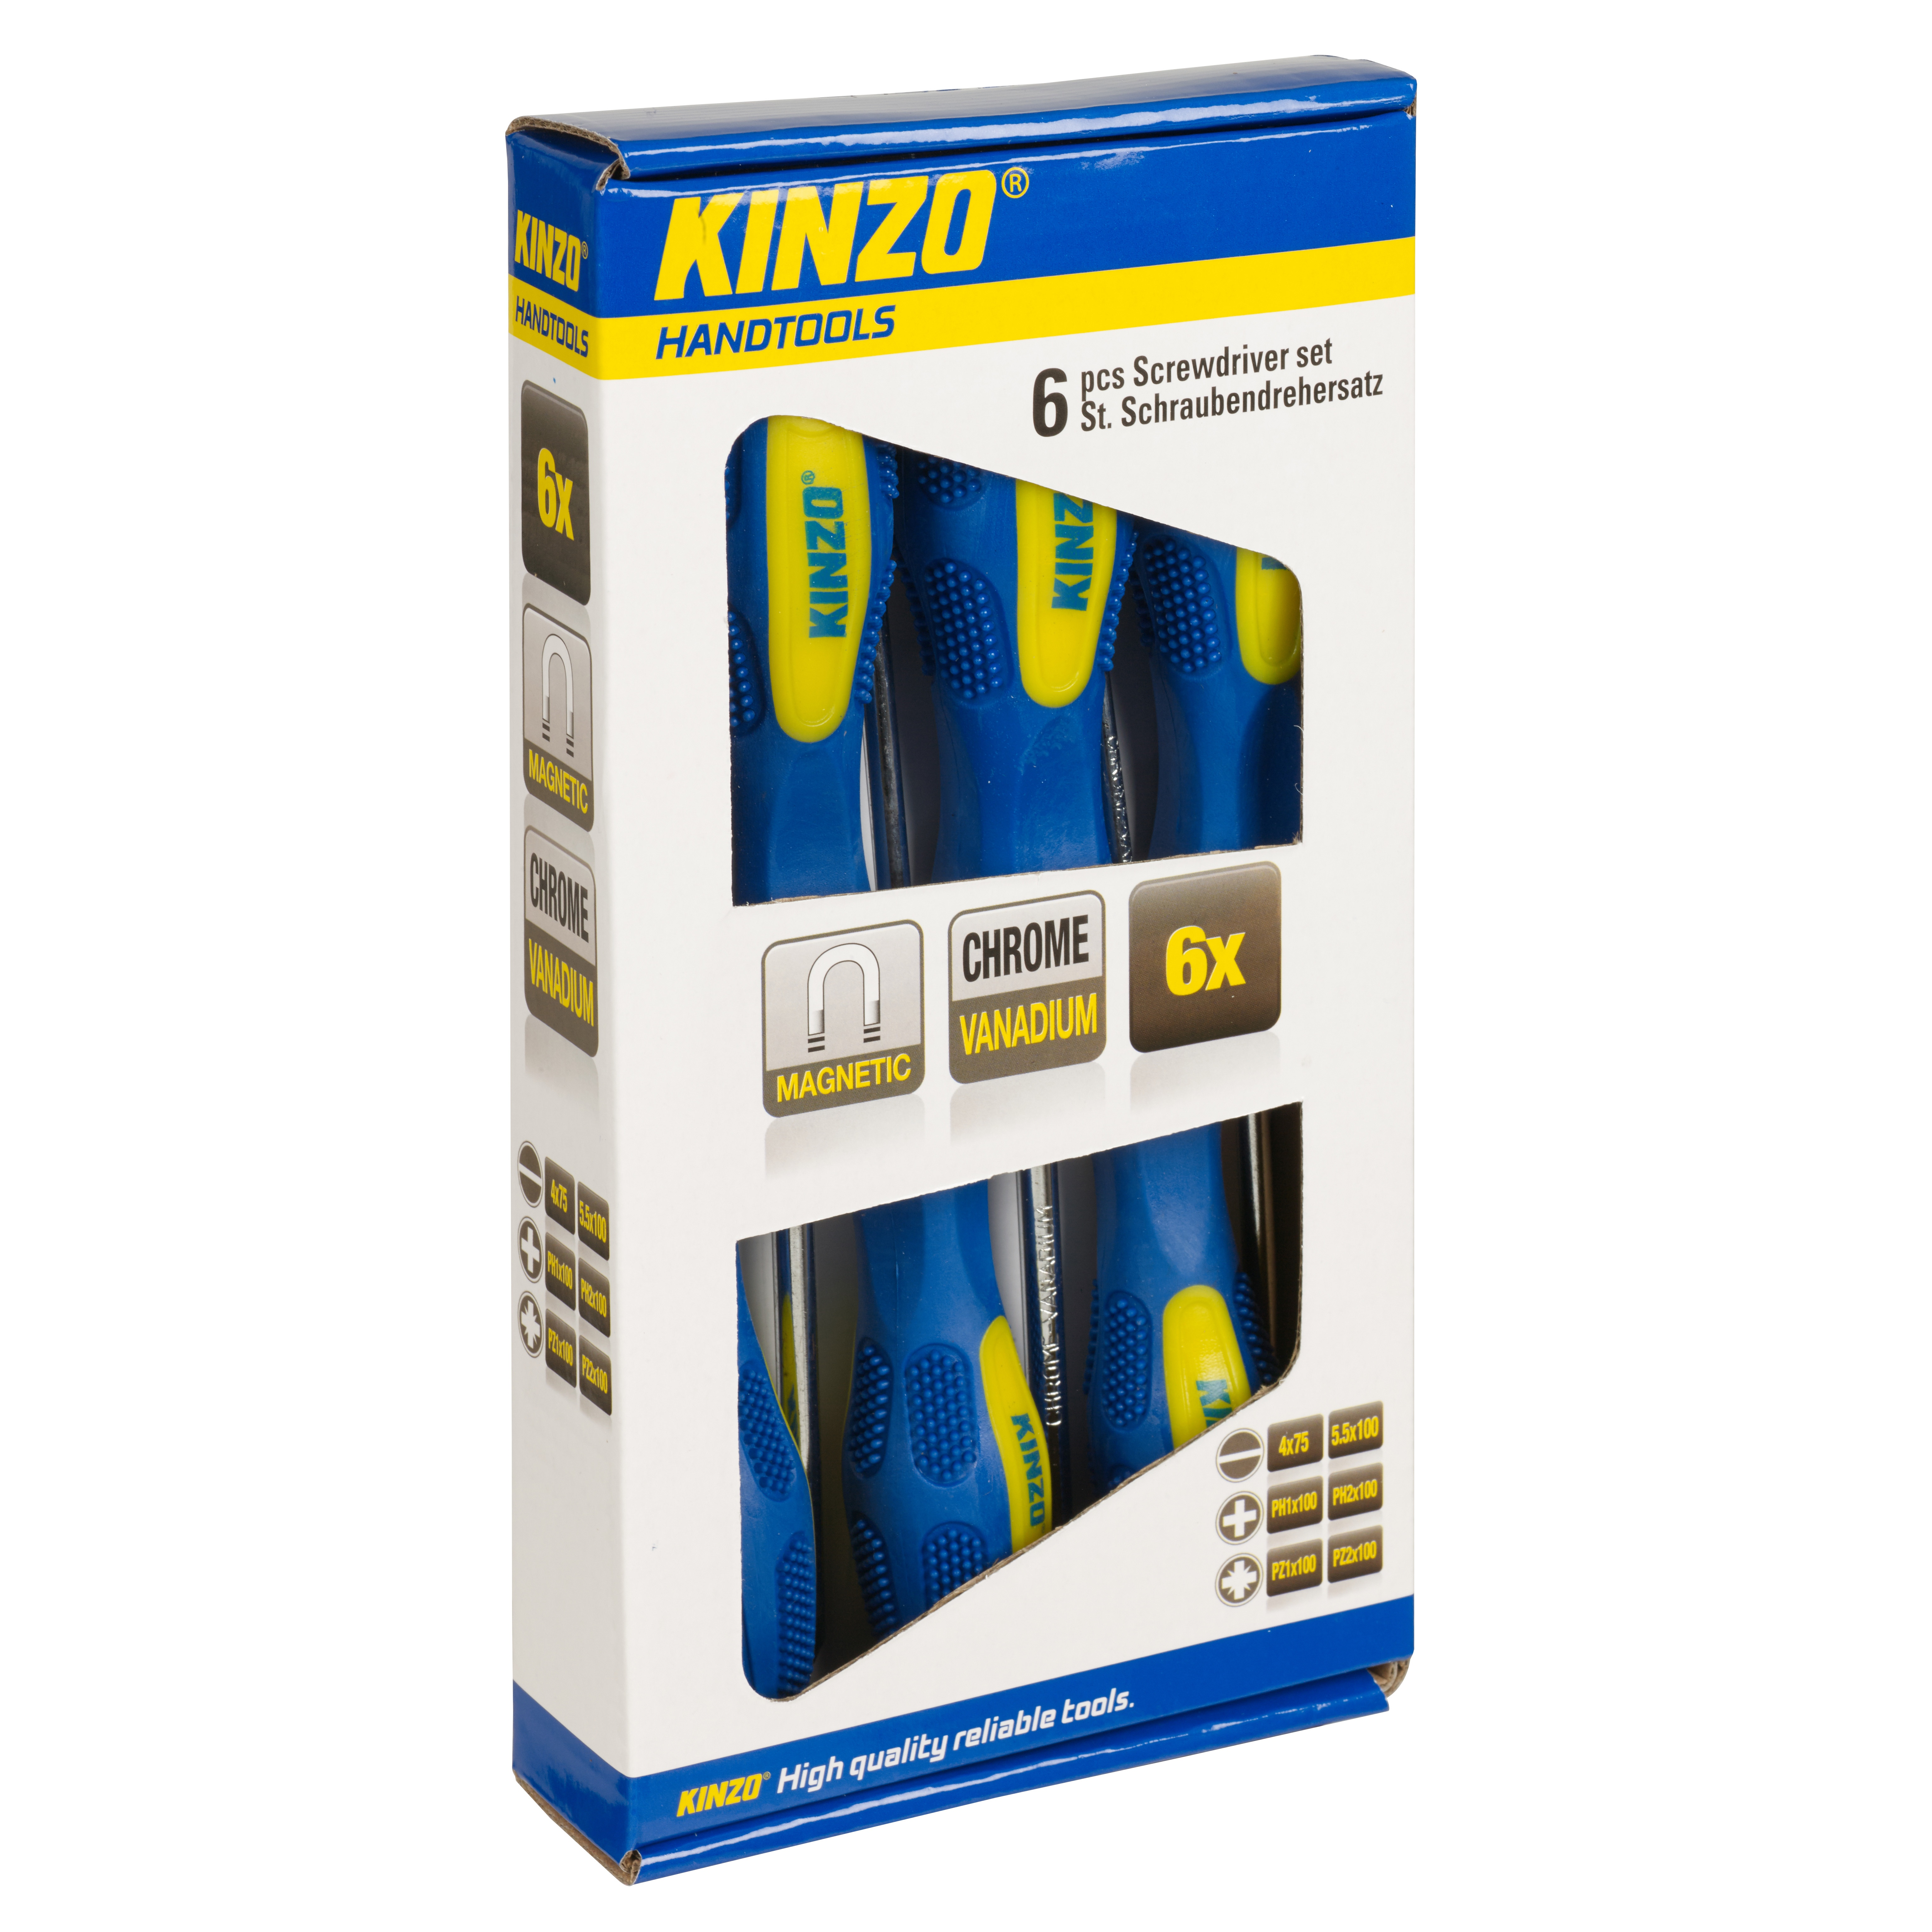 kinzo 6pc screwdriver tool set magnetic tip chrome vanadium philips flat slotted. Black Bedroom Furniture Sets. Home Design Ideas